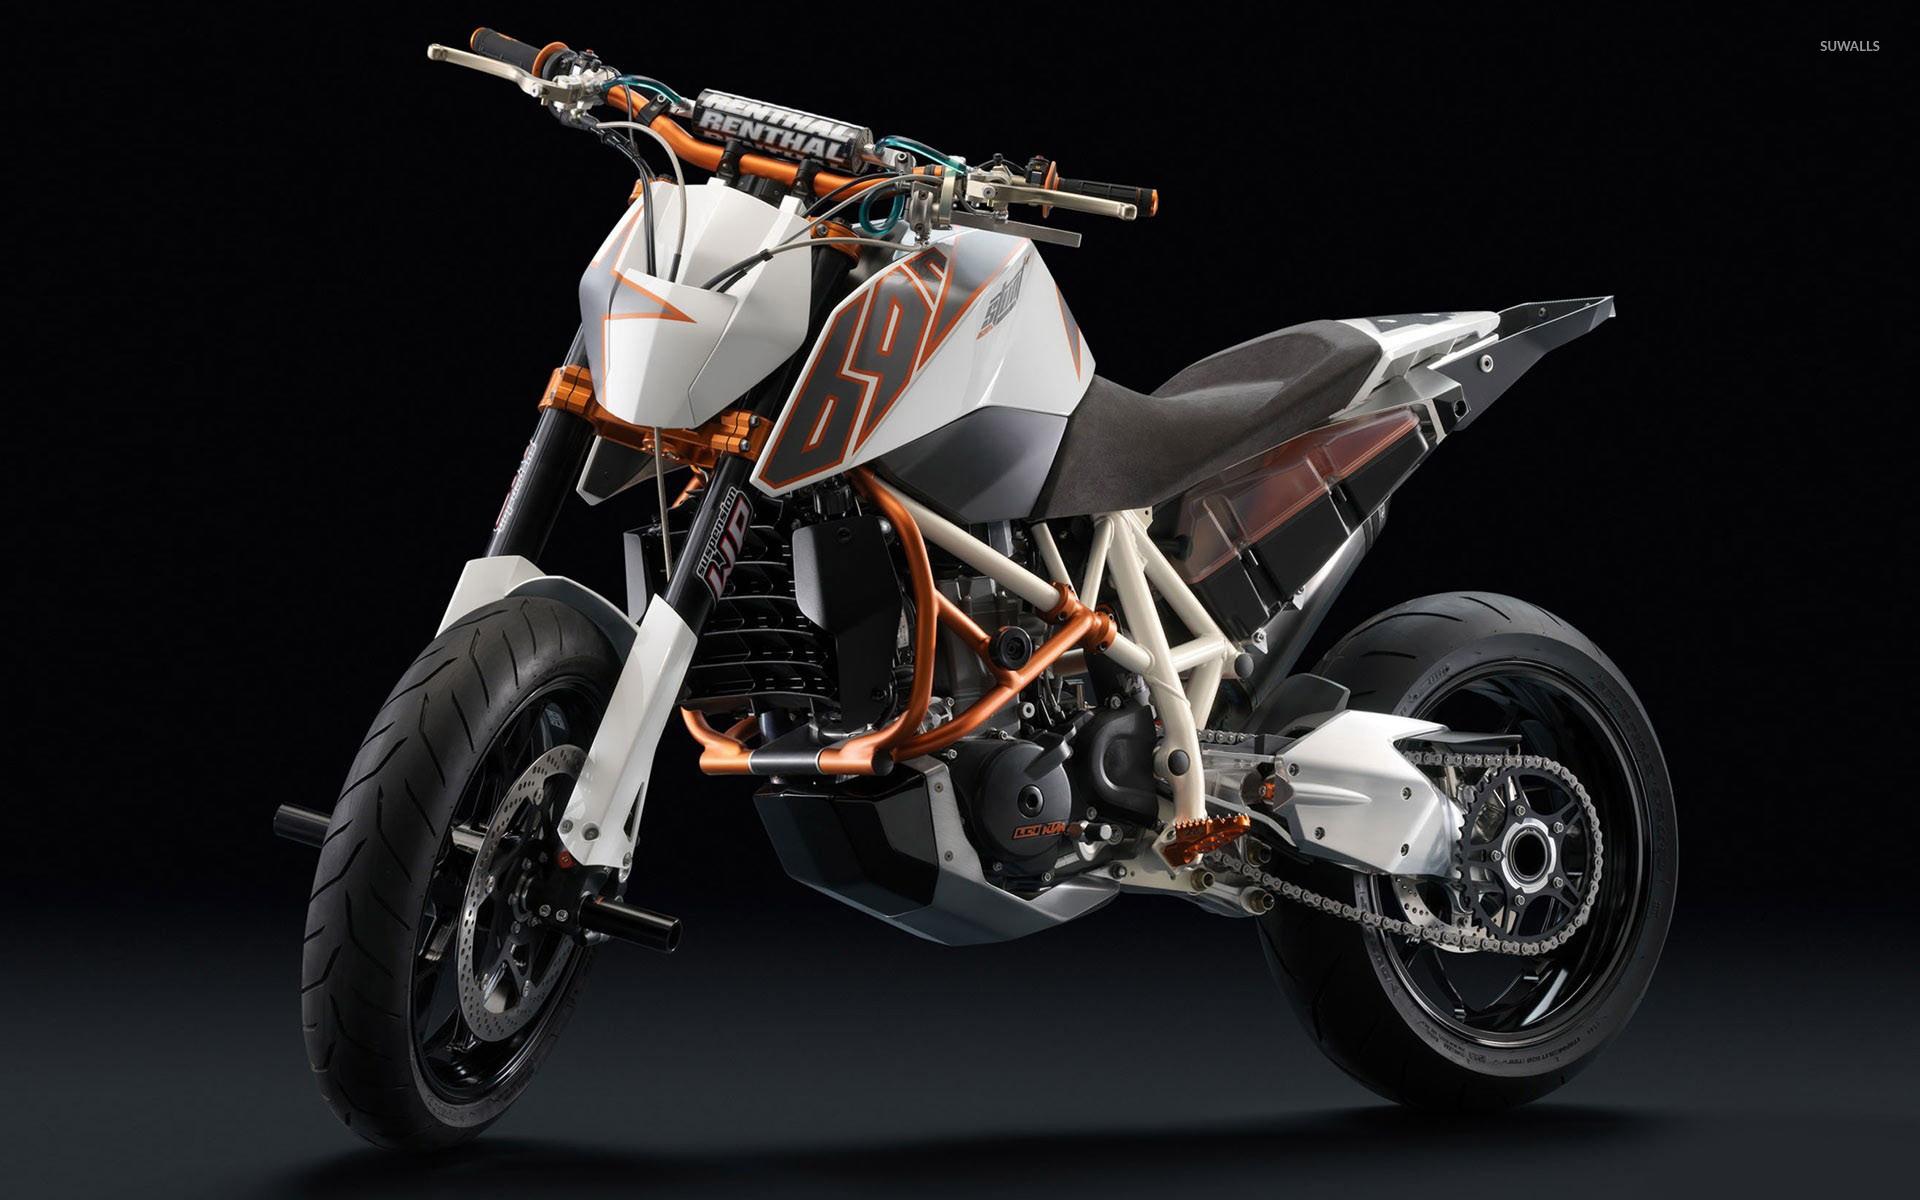 Ktm 690 Duke R Wallpaper Motorcycle Wallpapers 24054